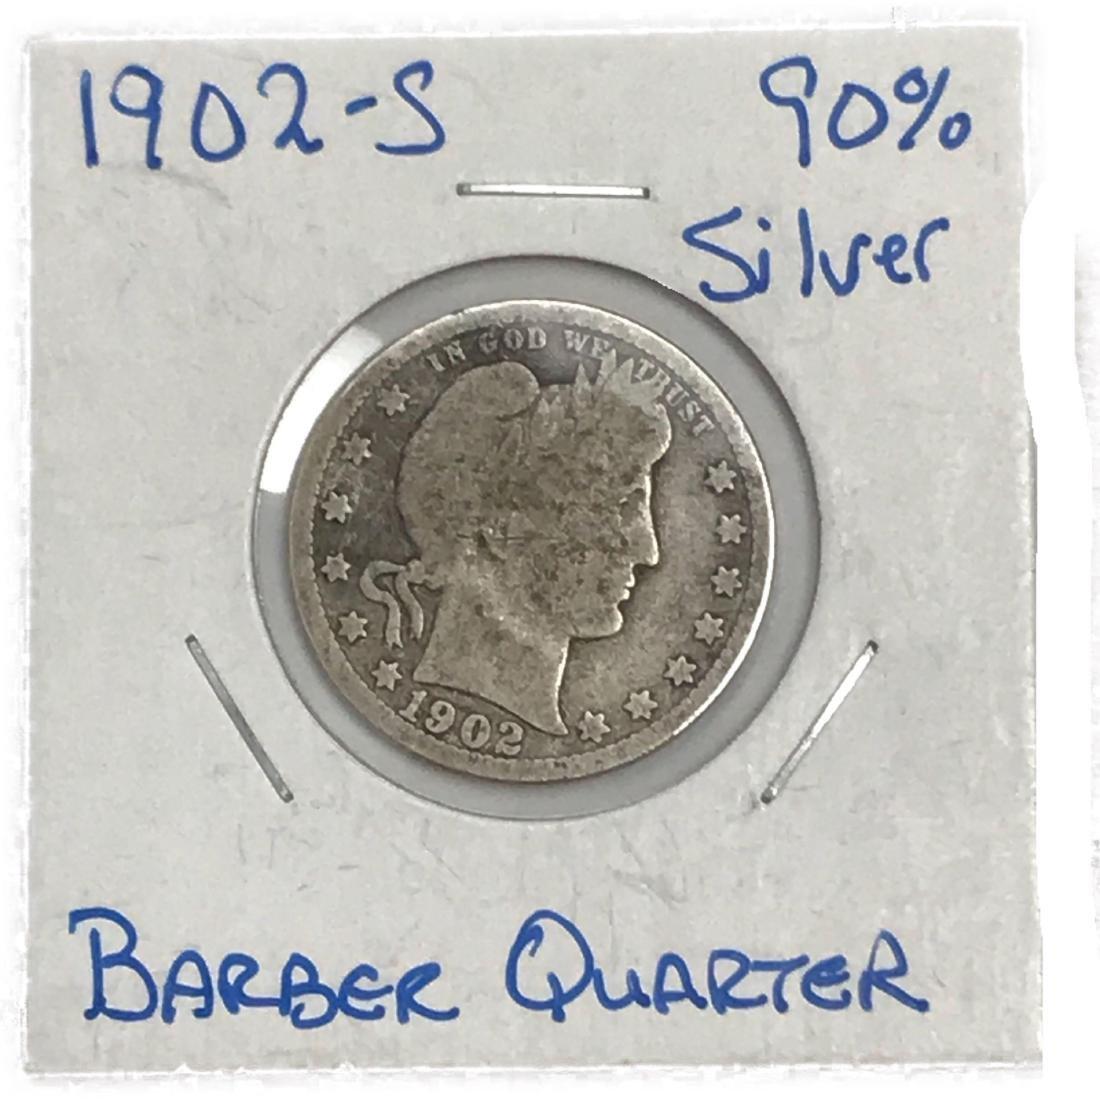 1902-S Barber Quarter Silver Twenty-Five Cent Coin